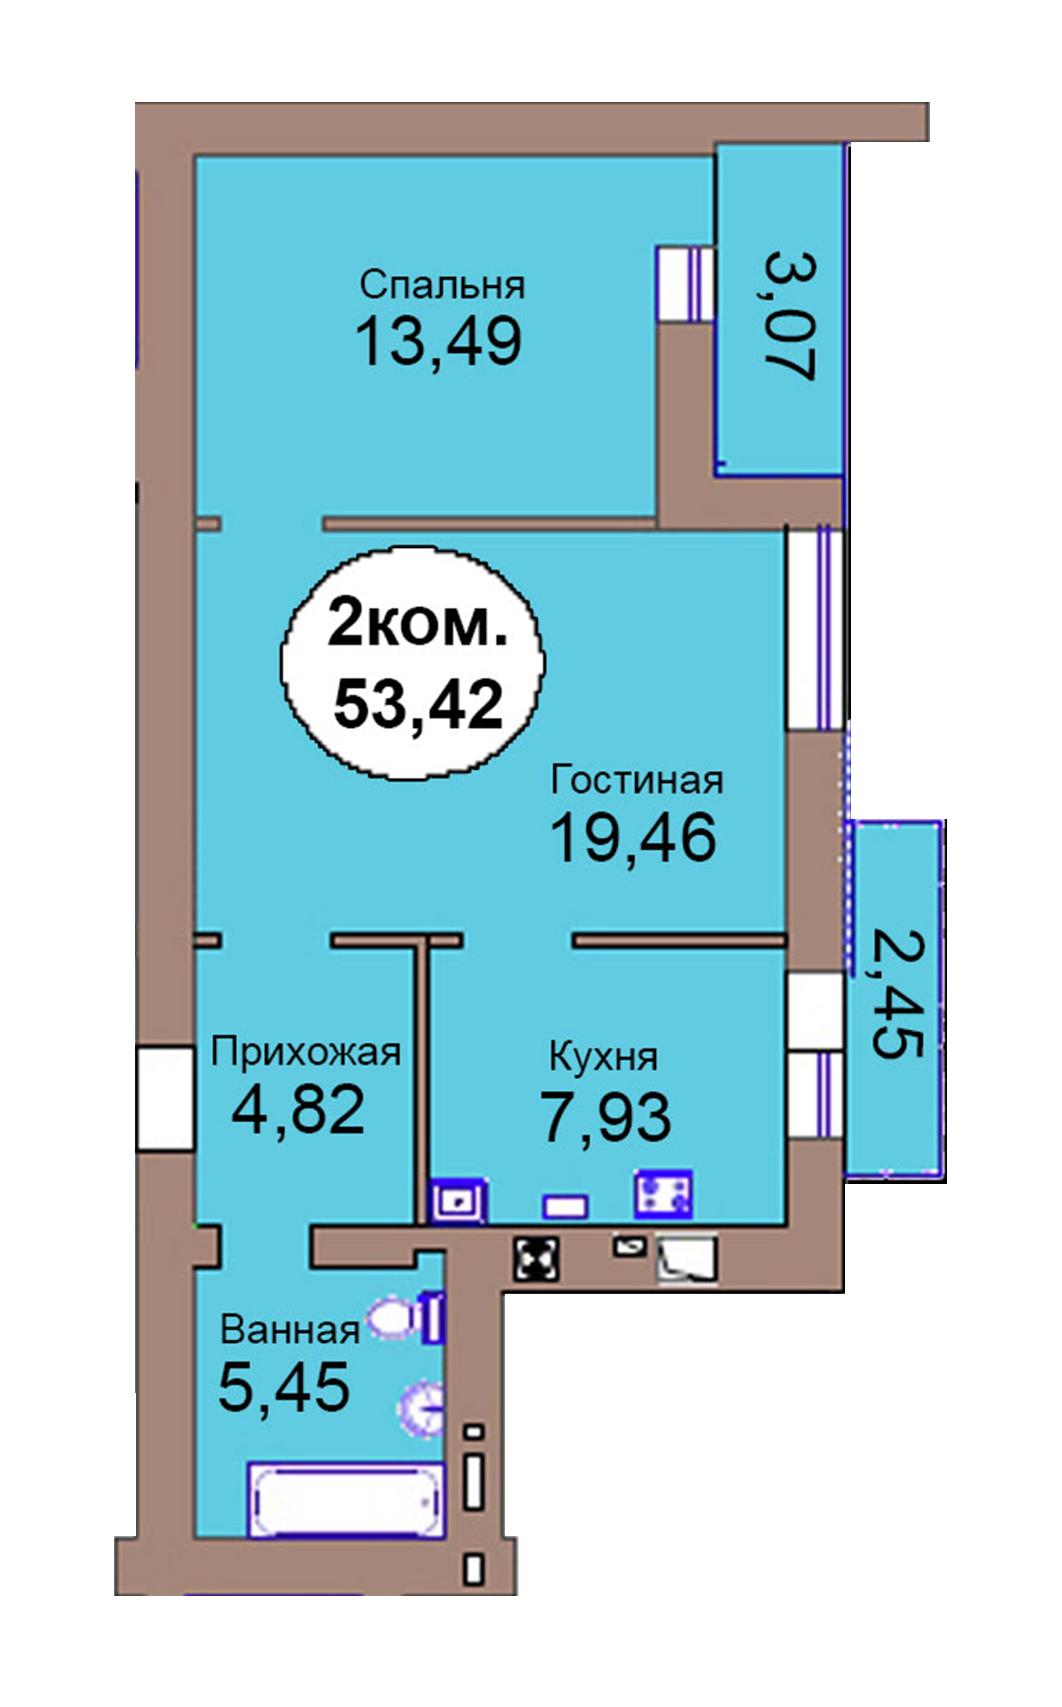 2-комн. кв. по пер. Калининградский, 4  кв. 84 в Калининграде